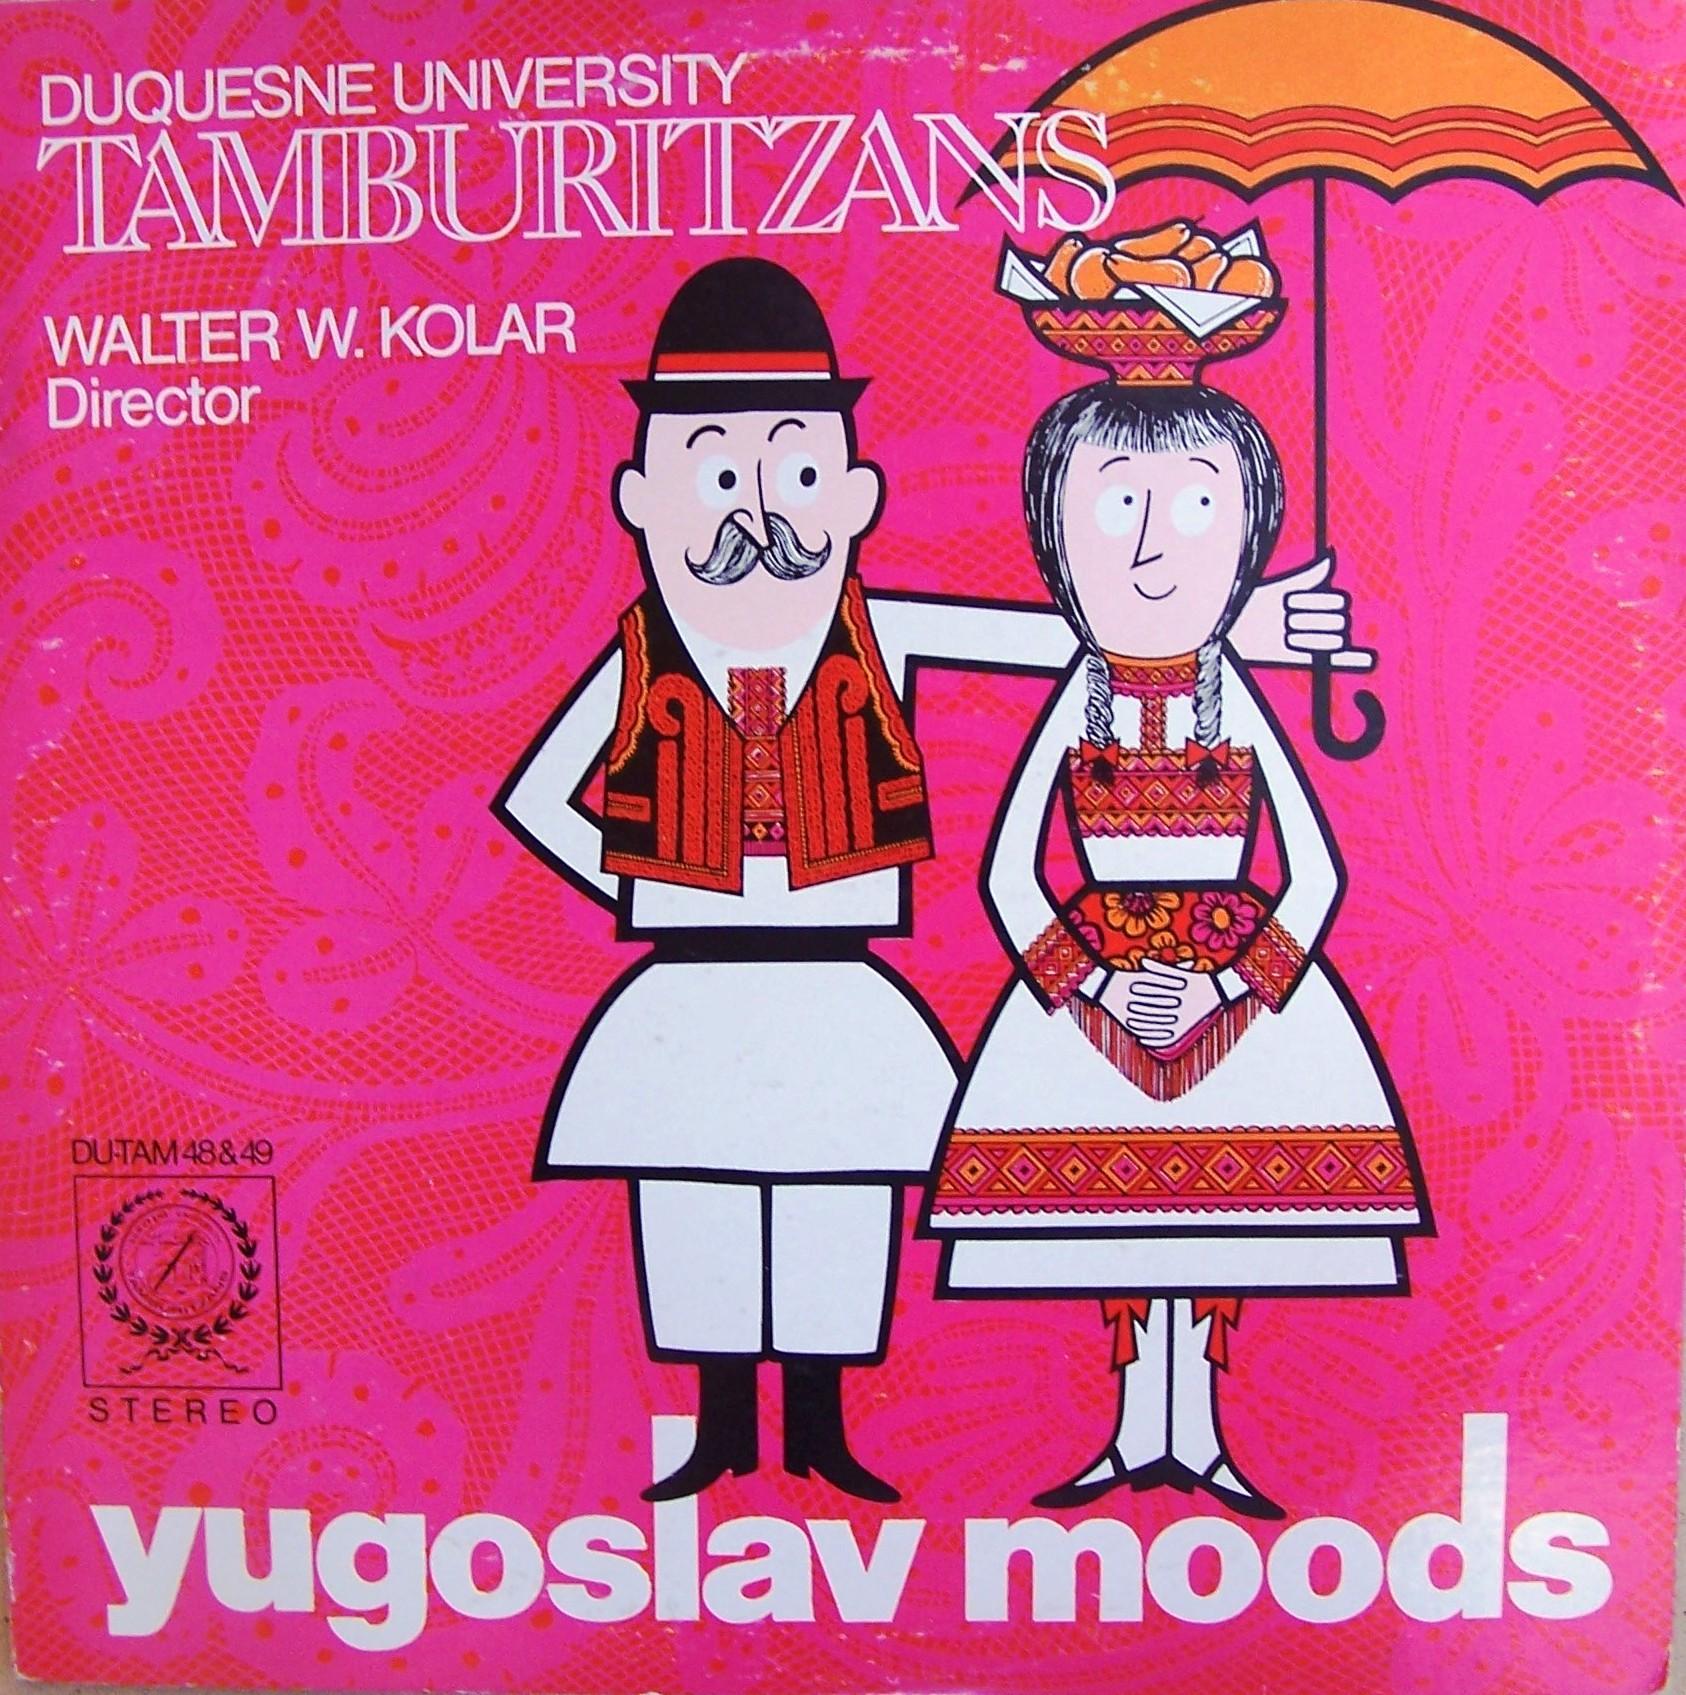 Duquesne University Tamburitzas - Yugoslav Moods